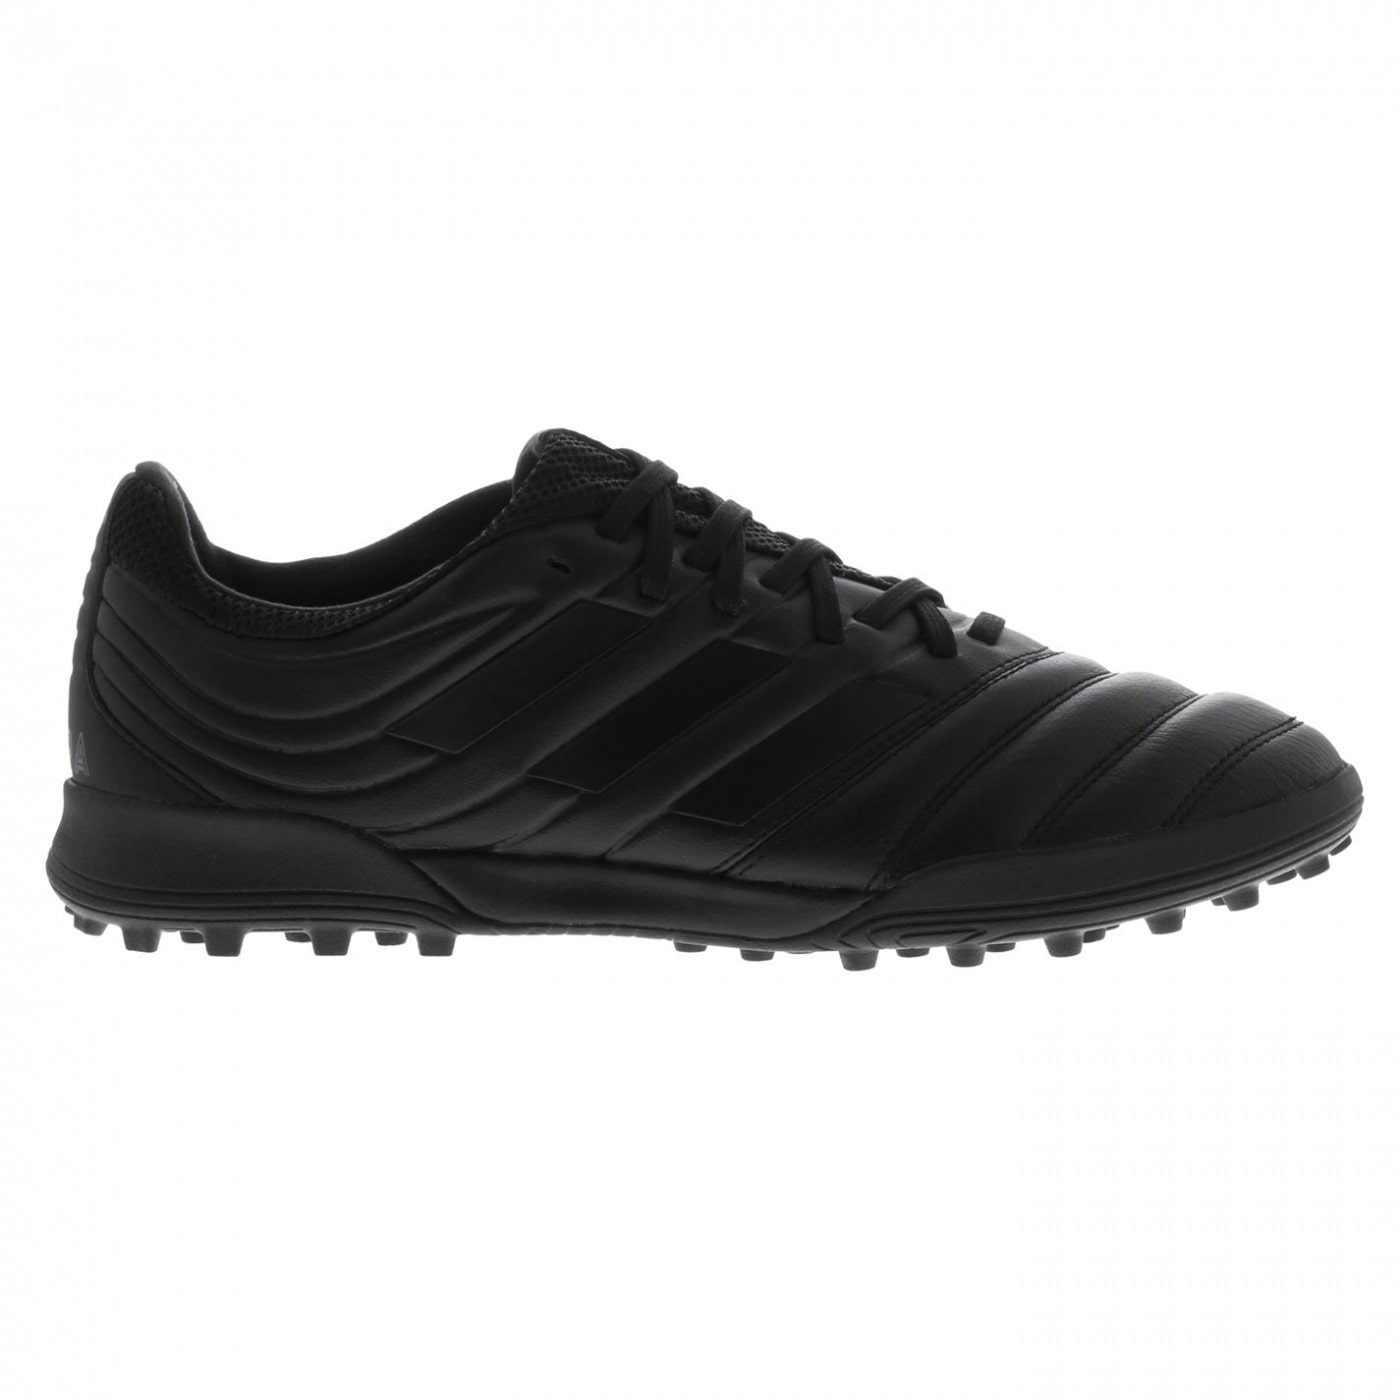 Adidas Copa 19.3 Mens Astro Turf Football Trainers